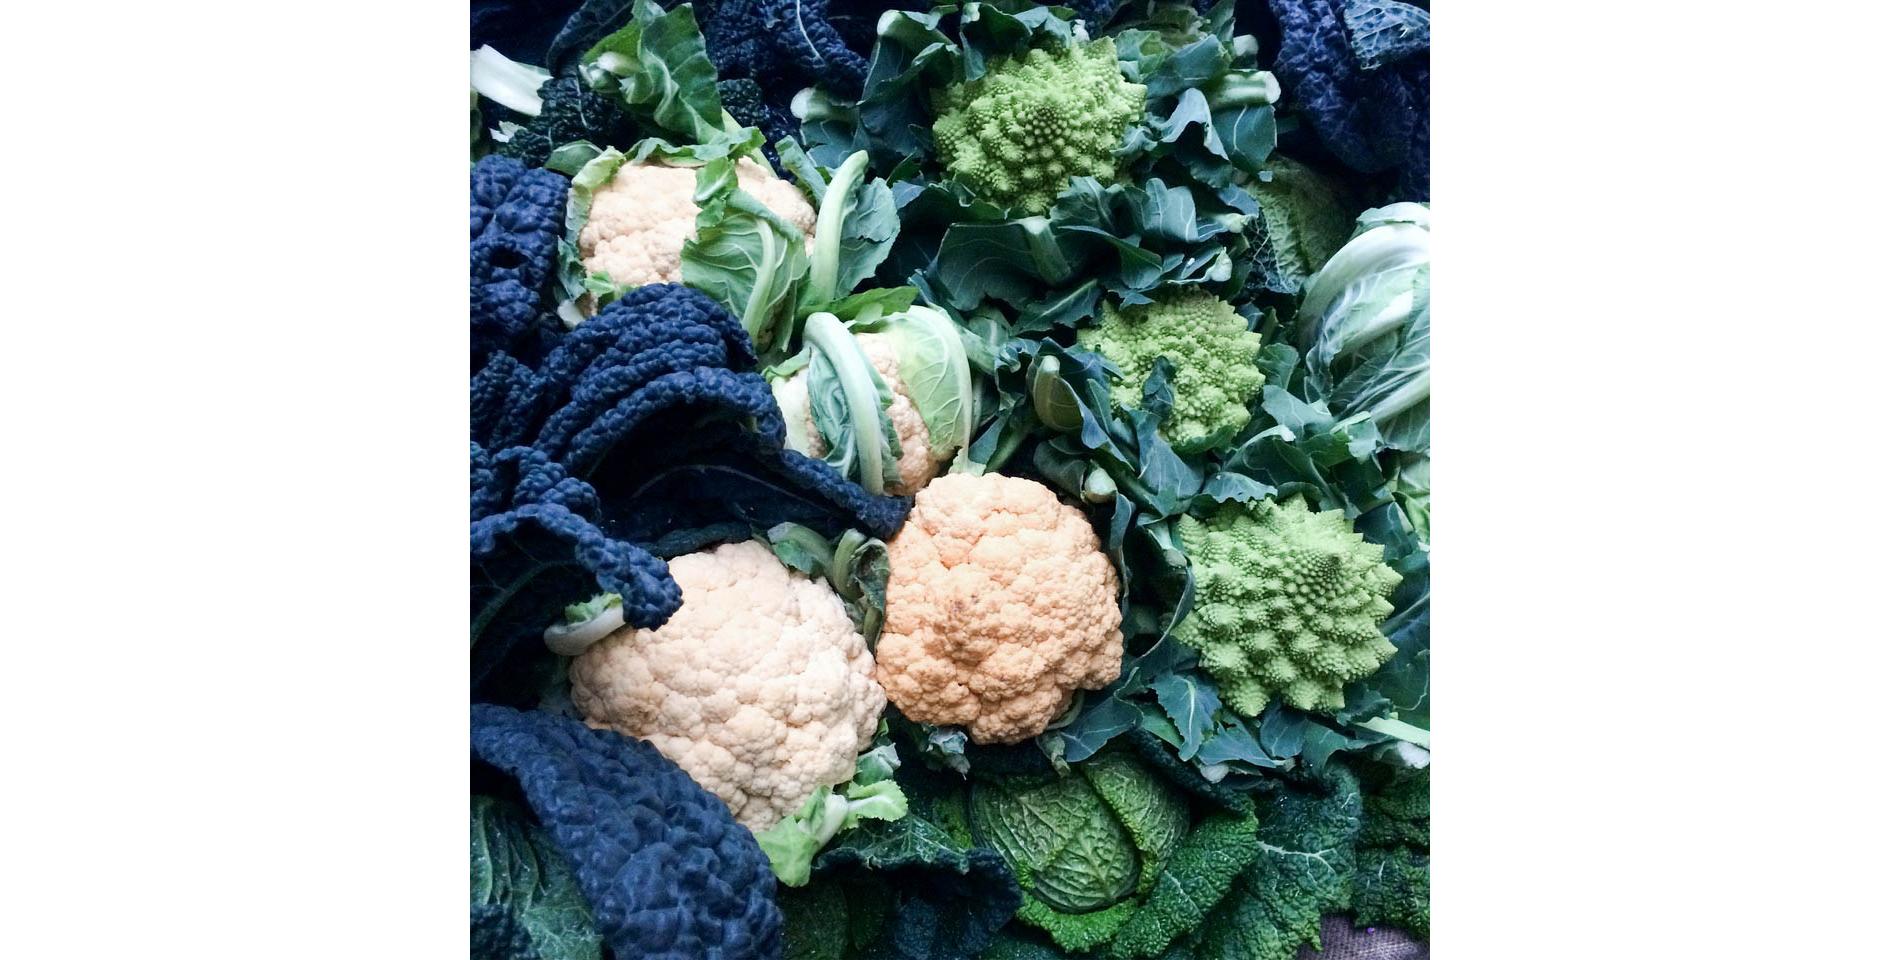 Immunity-Boosting Foods-for-Flu-Season-vegan-ethical-clothing-uncaptive.jpg